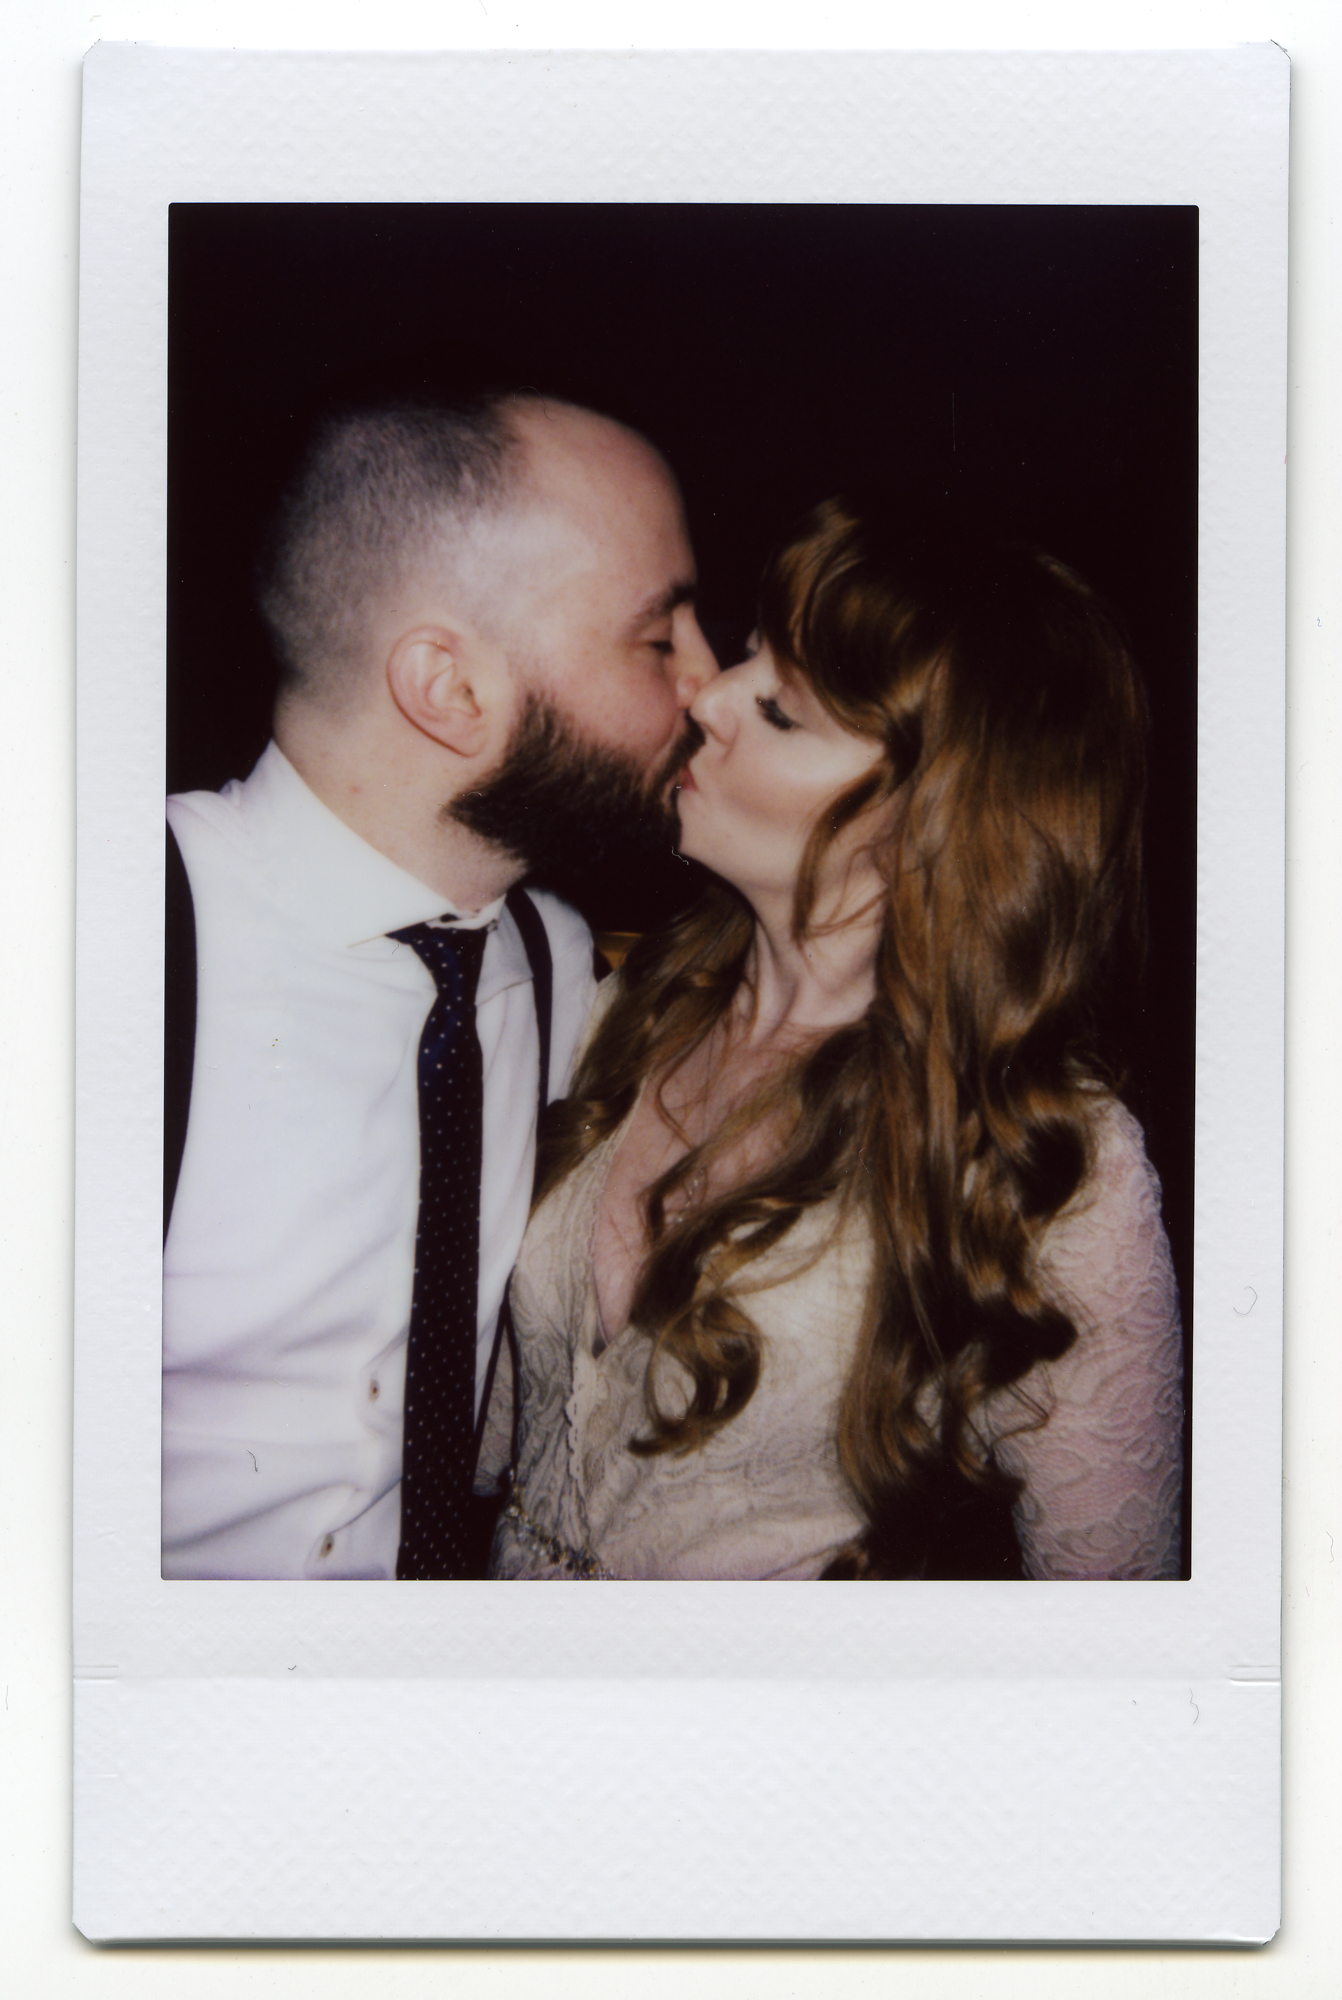 Wedding Instax photos